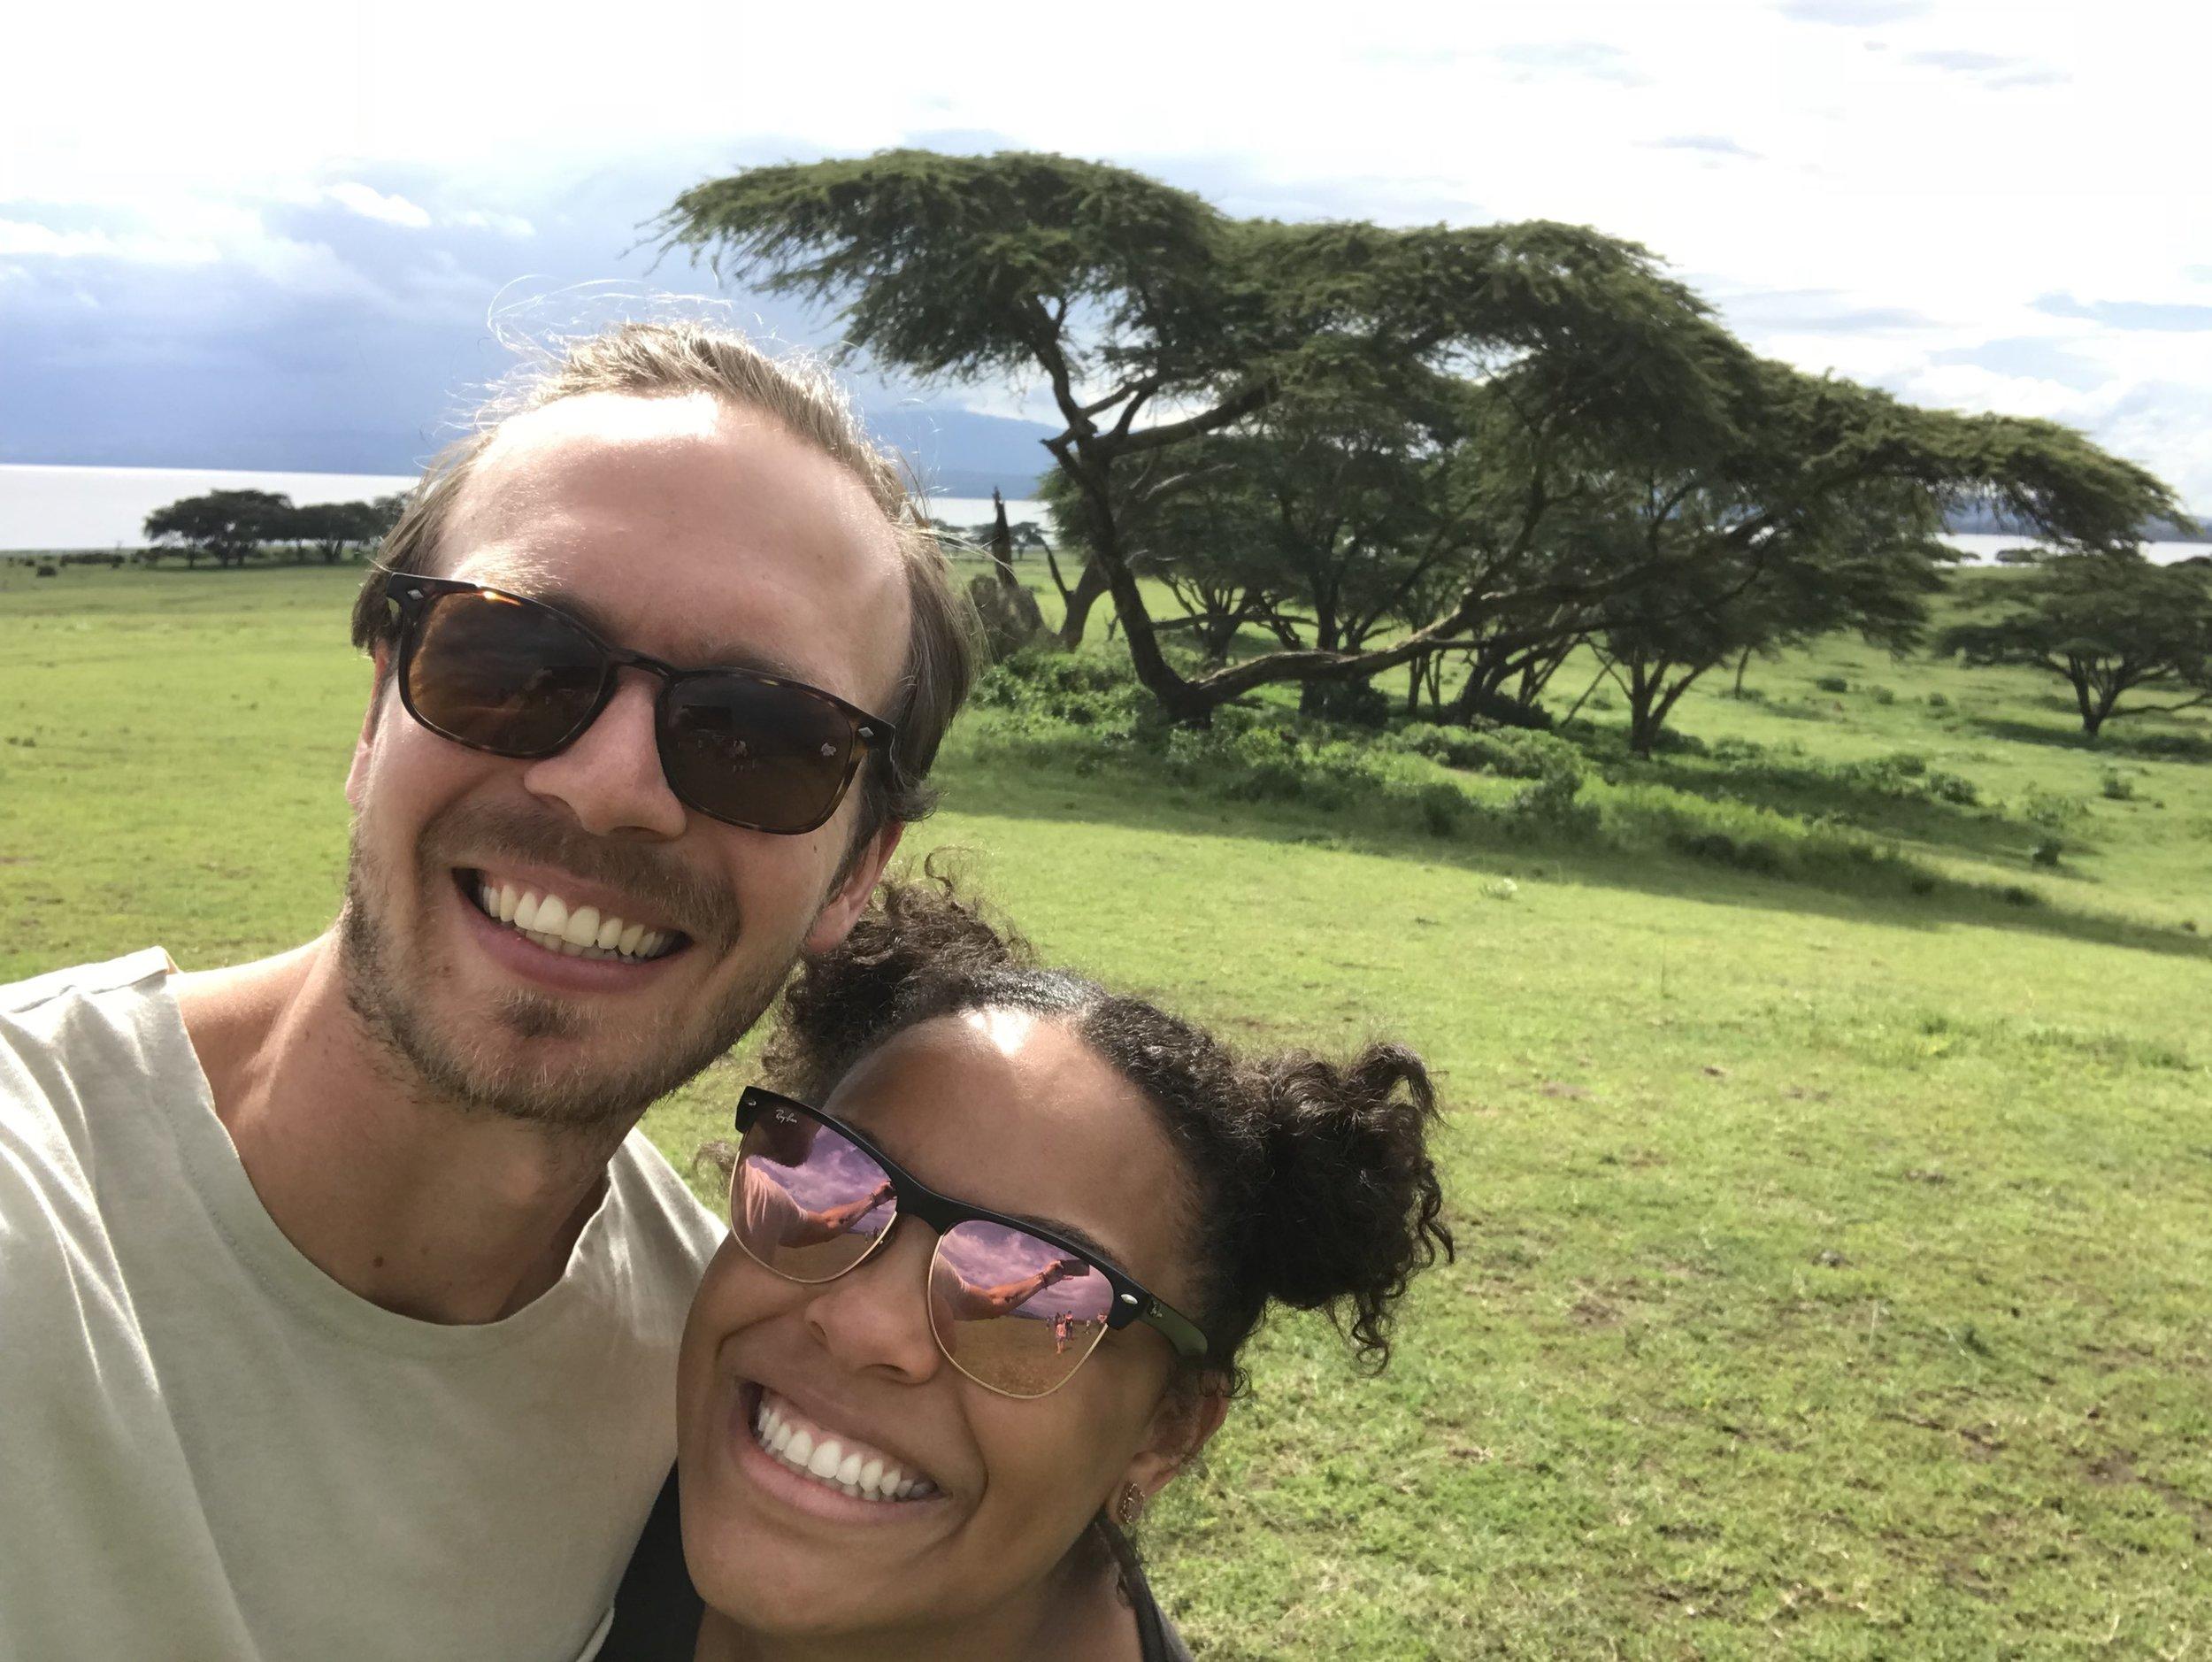 My fav girl and I on a walking safari in Kenya!